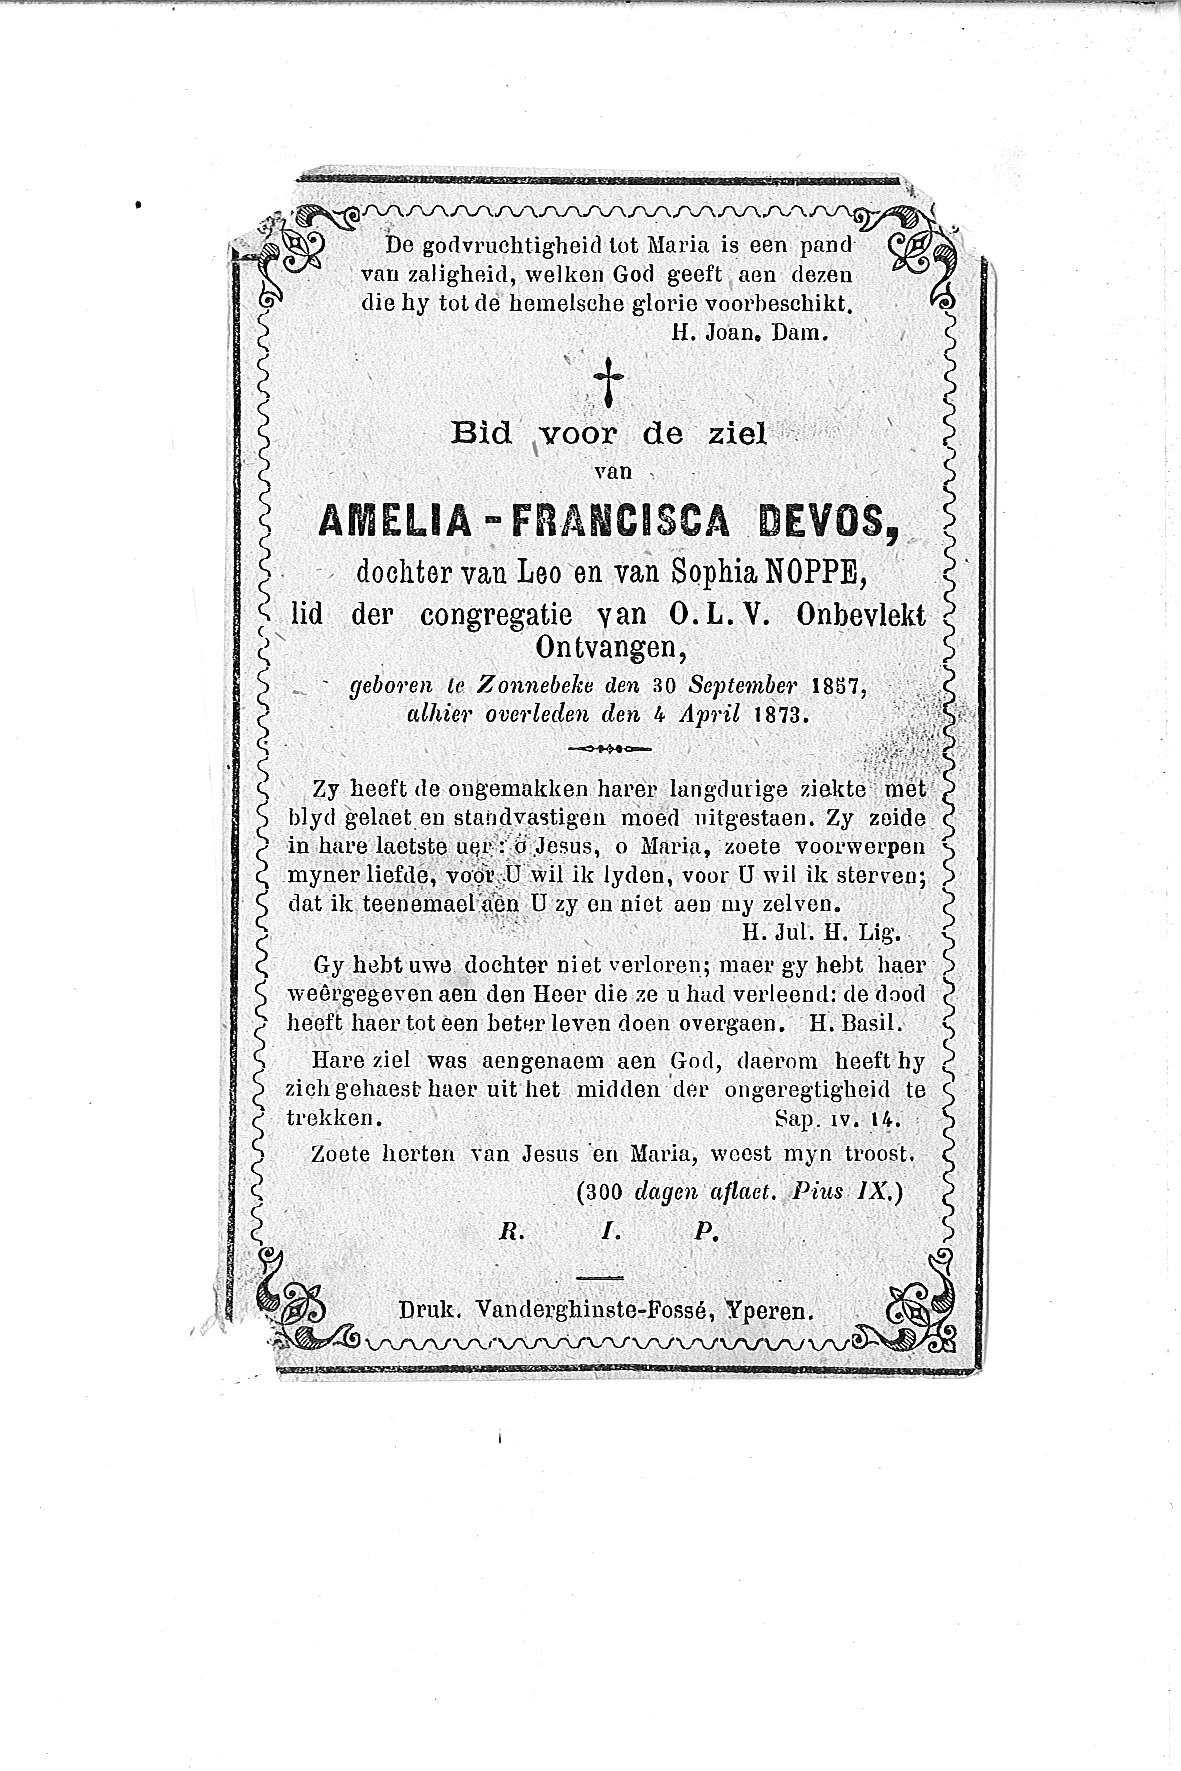 Amelia-Francisca (1873) 20120309134858_00012.jpg